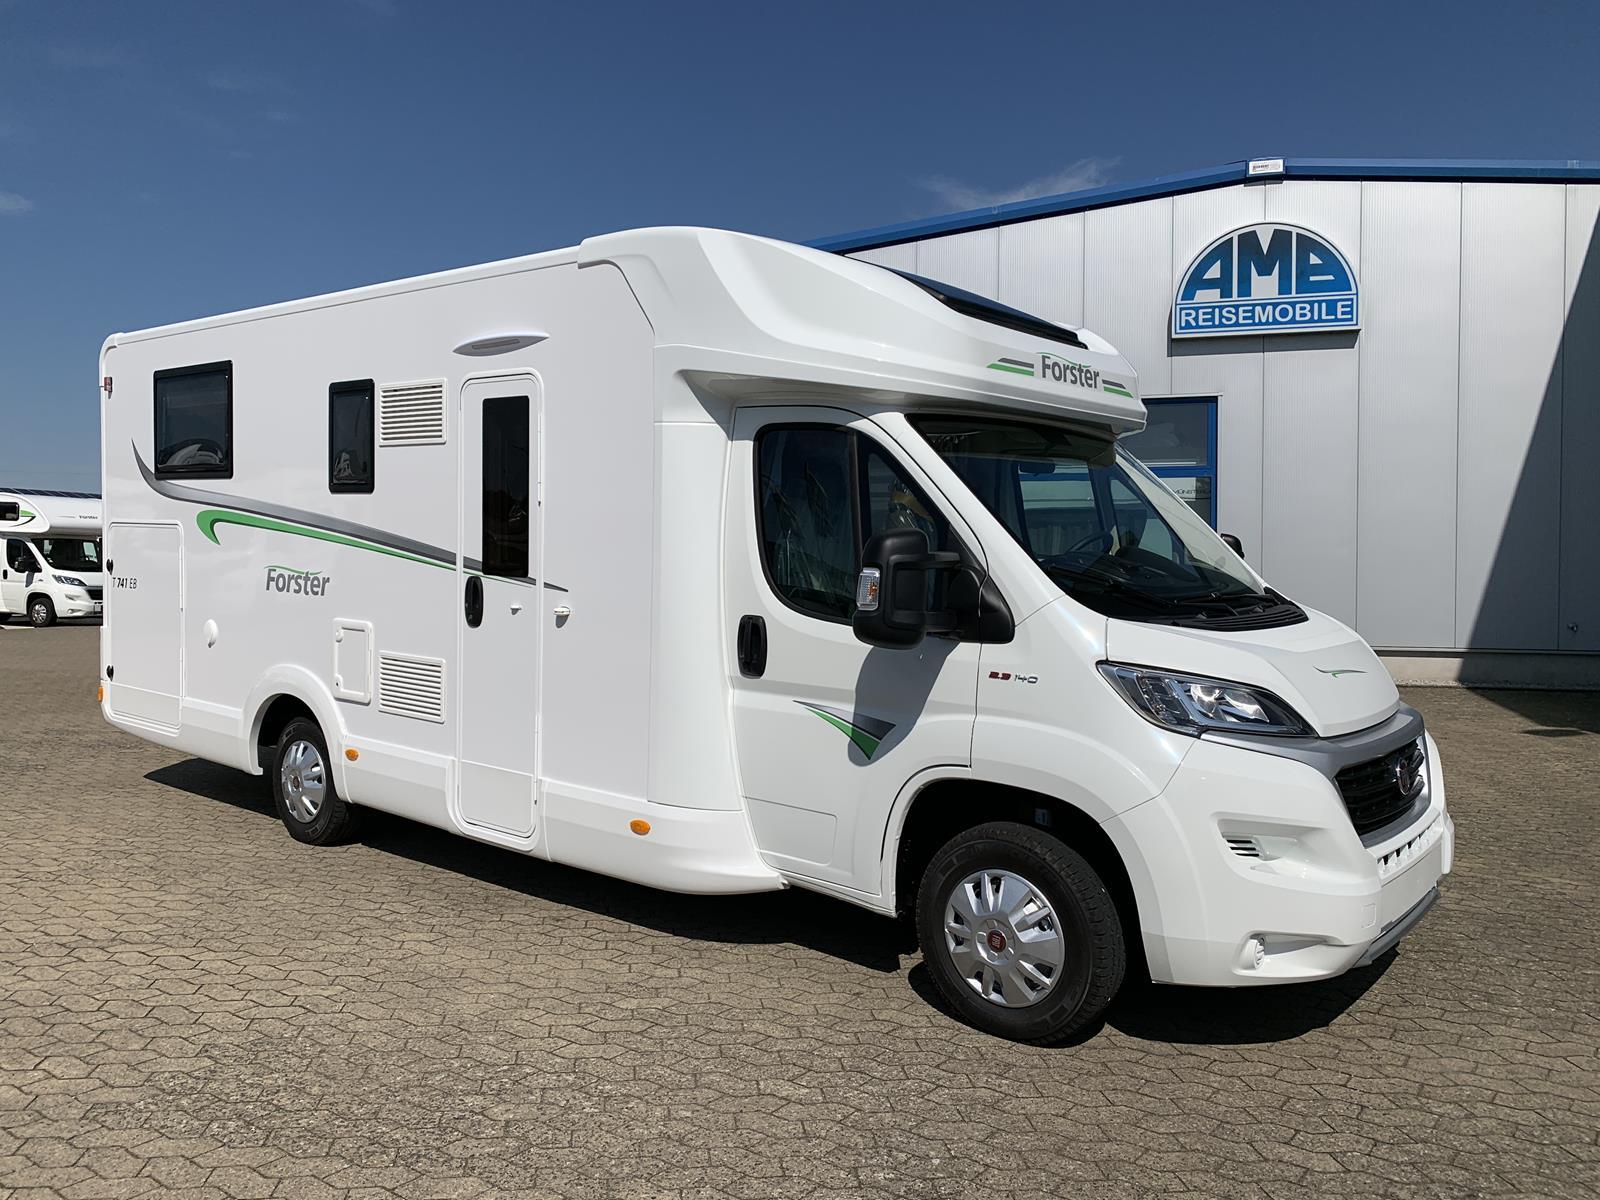 Forster T 8 QB Wohnmobil mieten - AMB Reisemobile GmbH - Camping